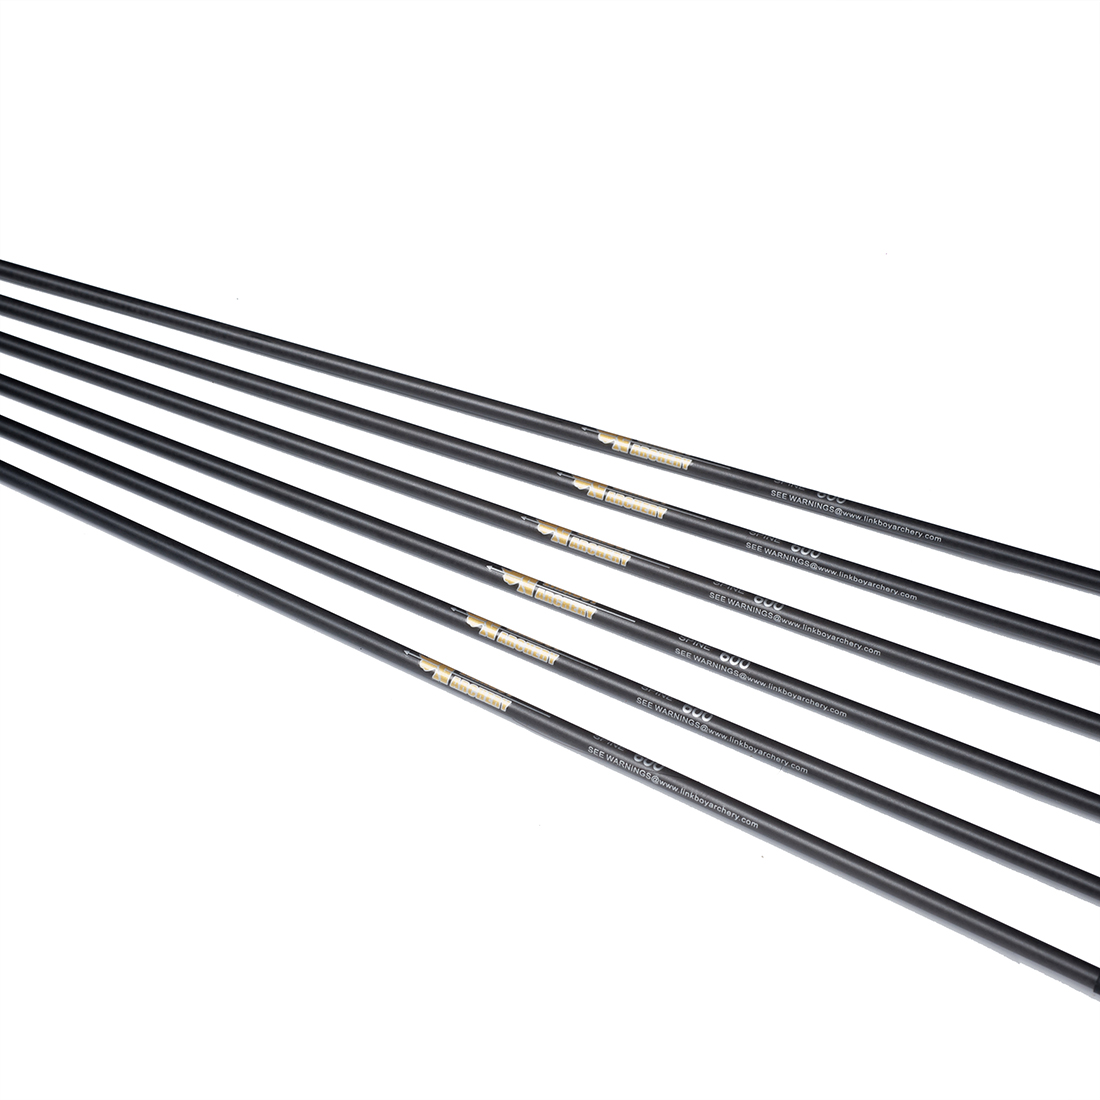 carbono puro eixo Spine400-1000 id4.2mm recurvo arco